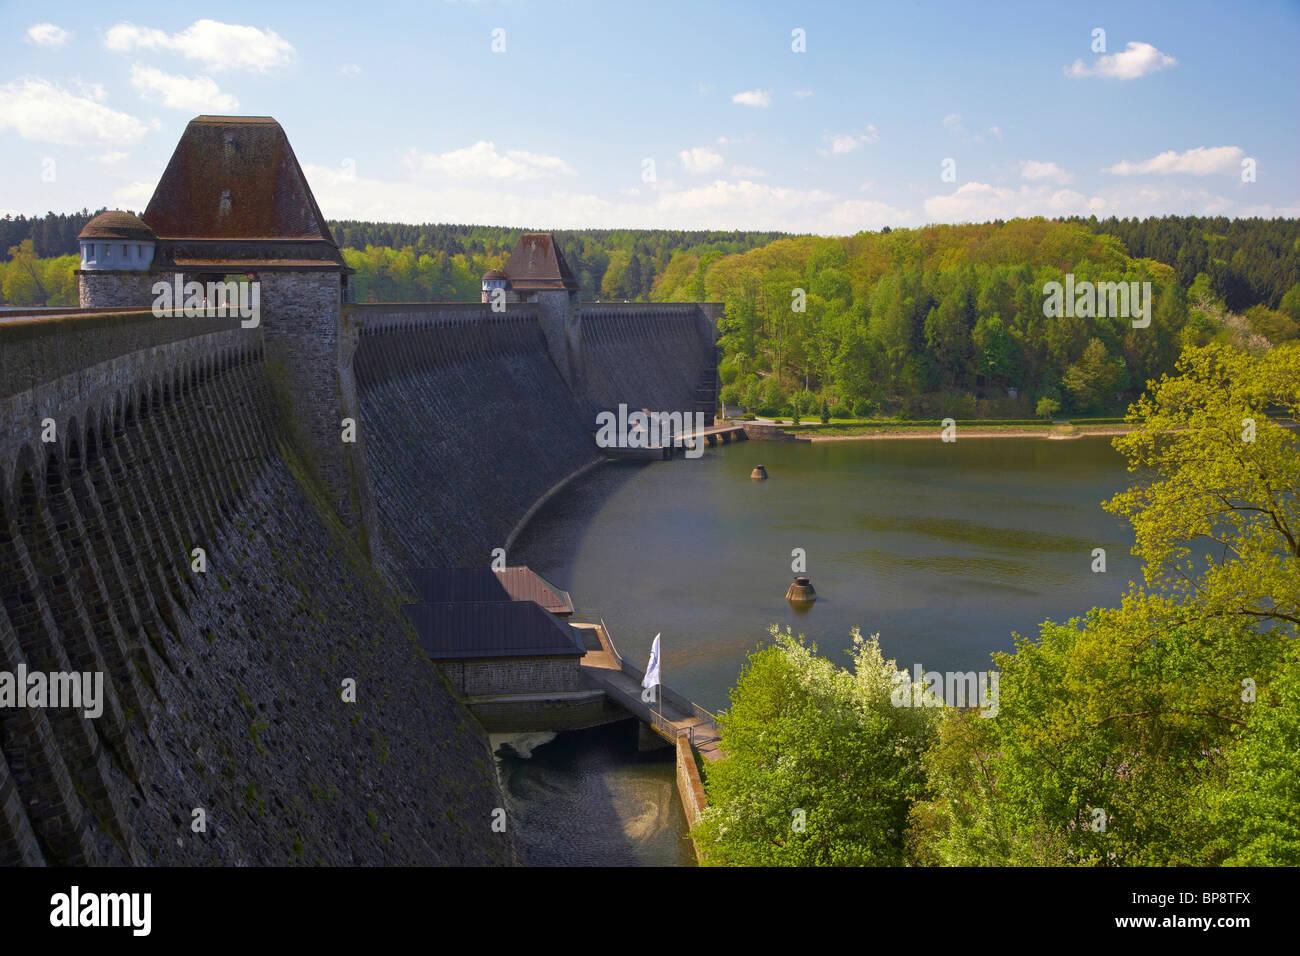 Dam at the Moehnesee, Naturpark Arnsberger Wald, Wildlife park, Sauerland, North Rhine-Westphalia, Germany, Europe - Stock Image